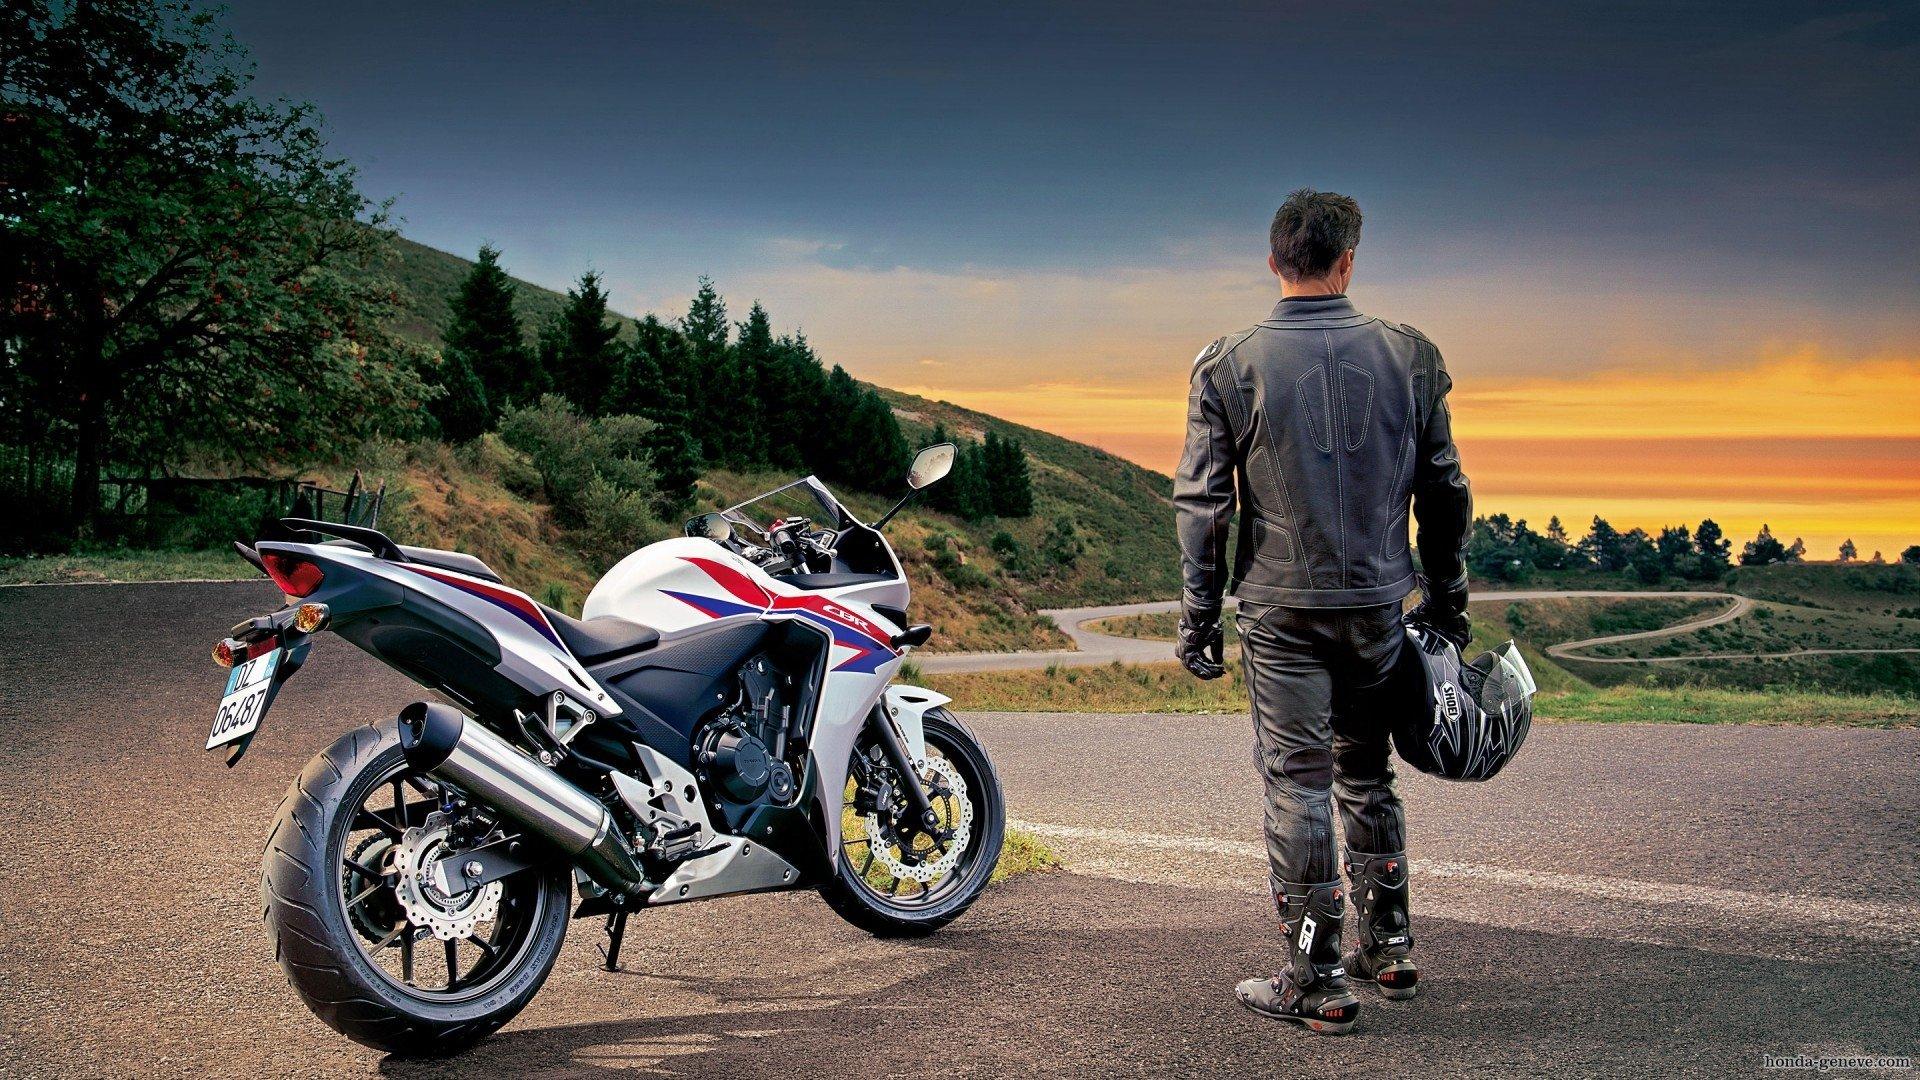 Honda CBR 500R Full HD Wallpaper and Background ...